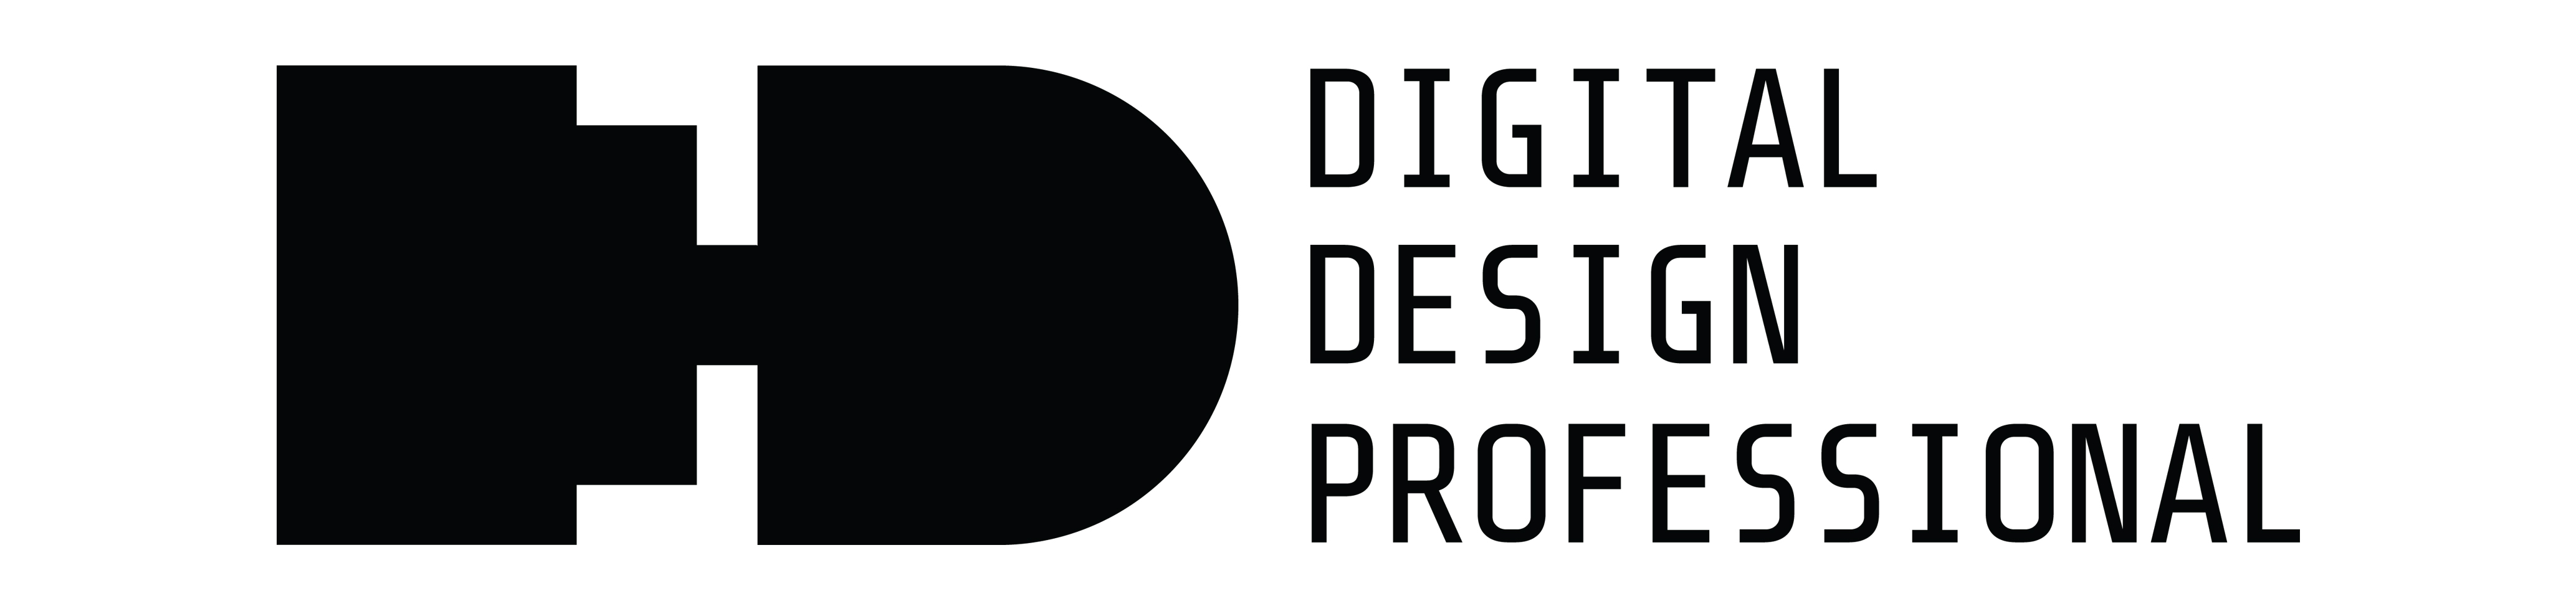 Digital Design Professional Logo